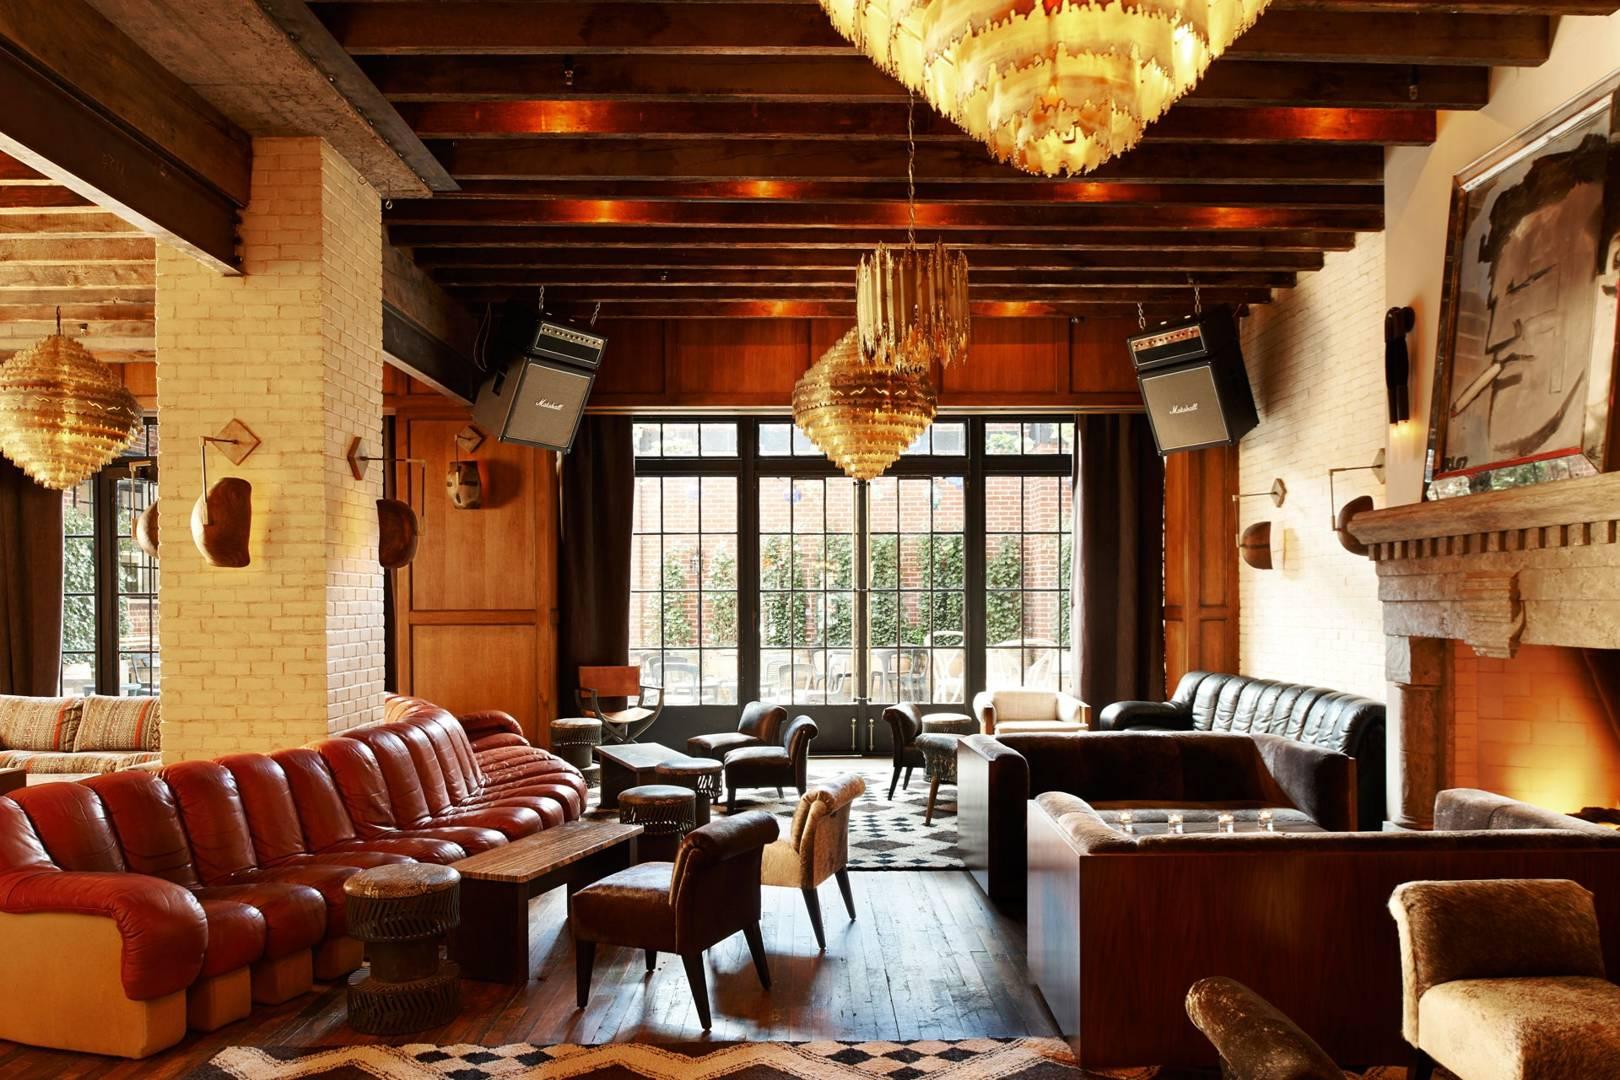 The Worlds Best New Hotels Hot List 2015 Cn Traveller Esprit Quilt Cover Set Lily Super King Size